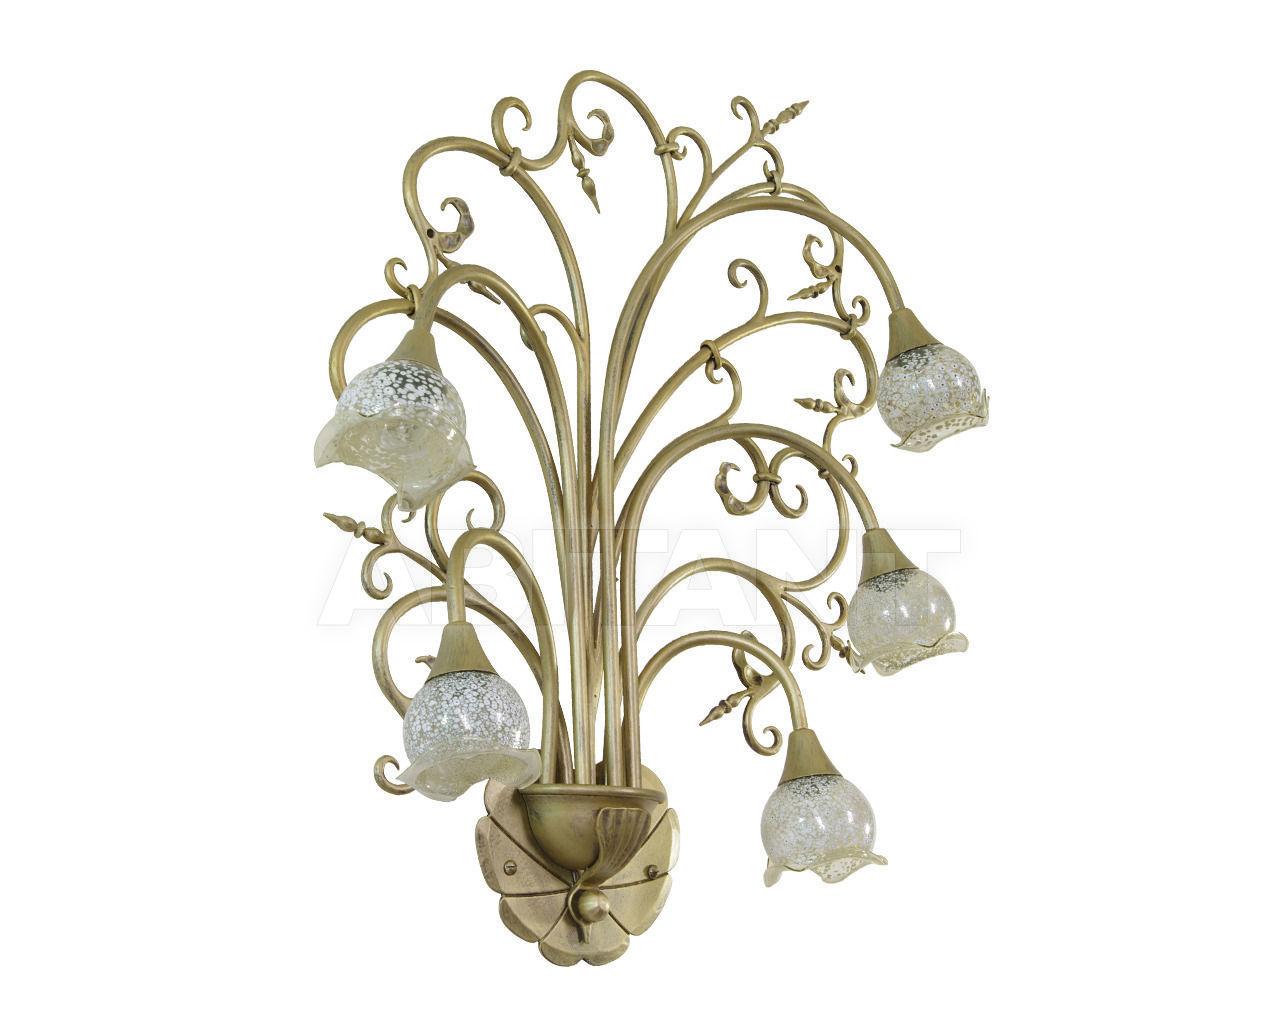 Купить Светильник настенный FMB Leuchten Schmiedeeisen Lampen Und Leuchten 94251